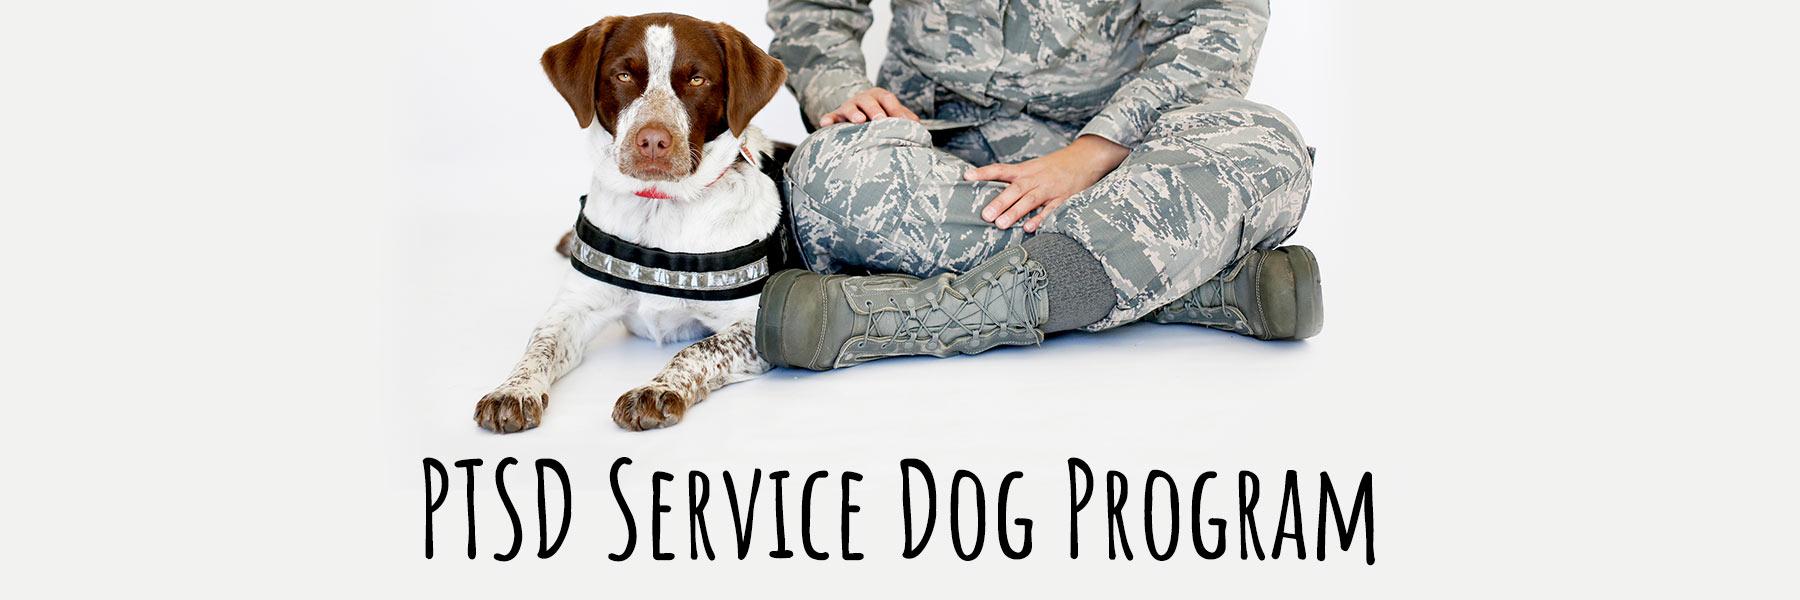 PTSD Service Dog Program